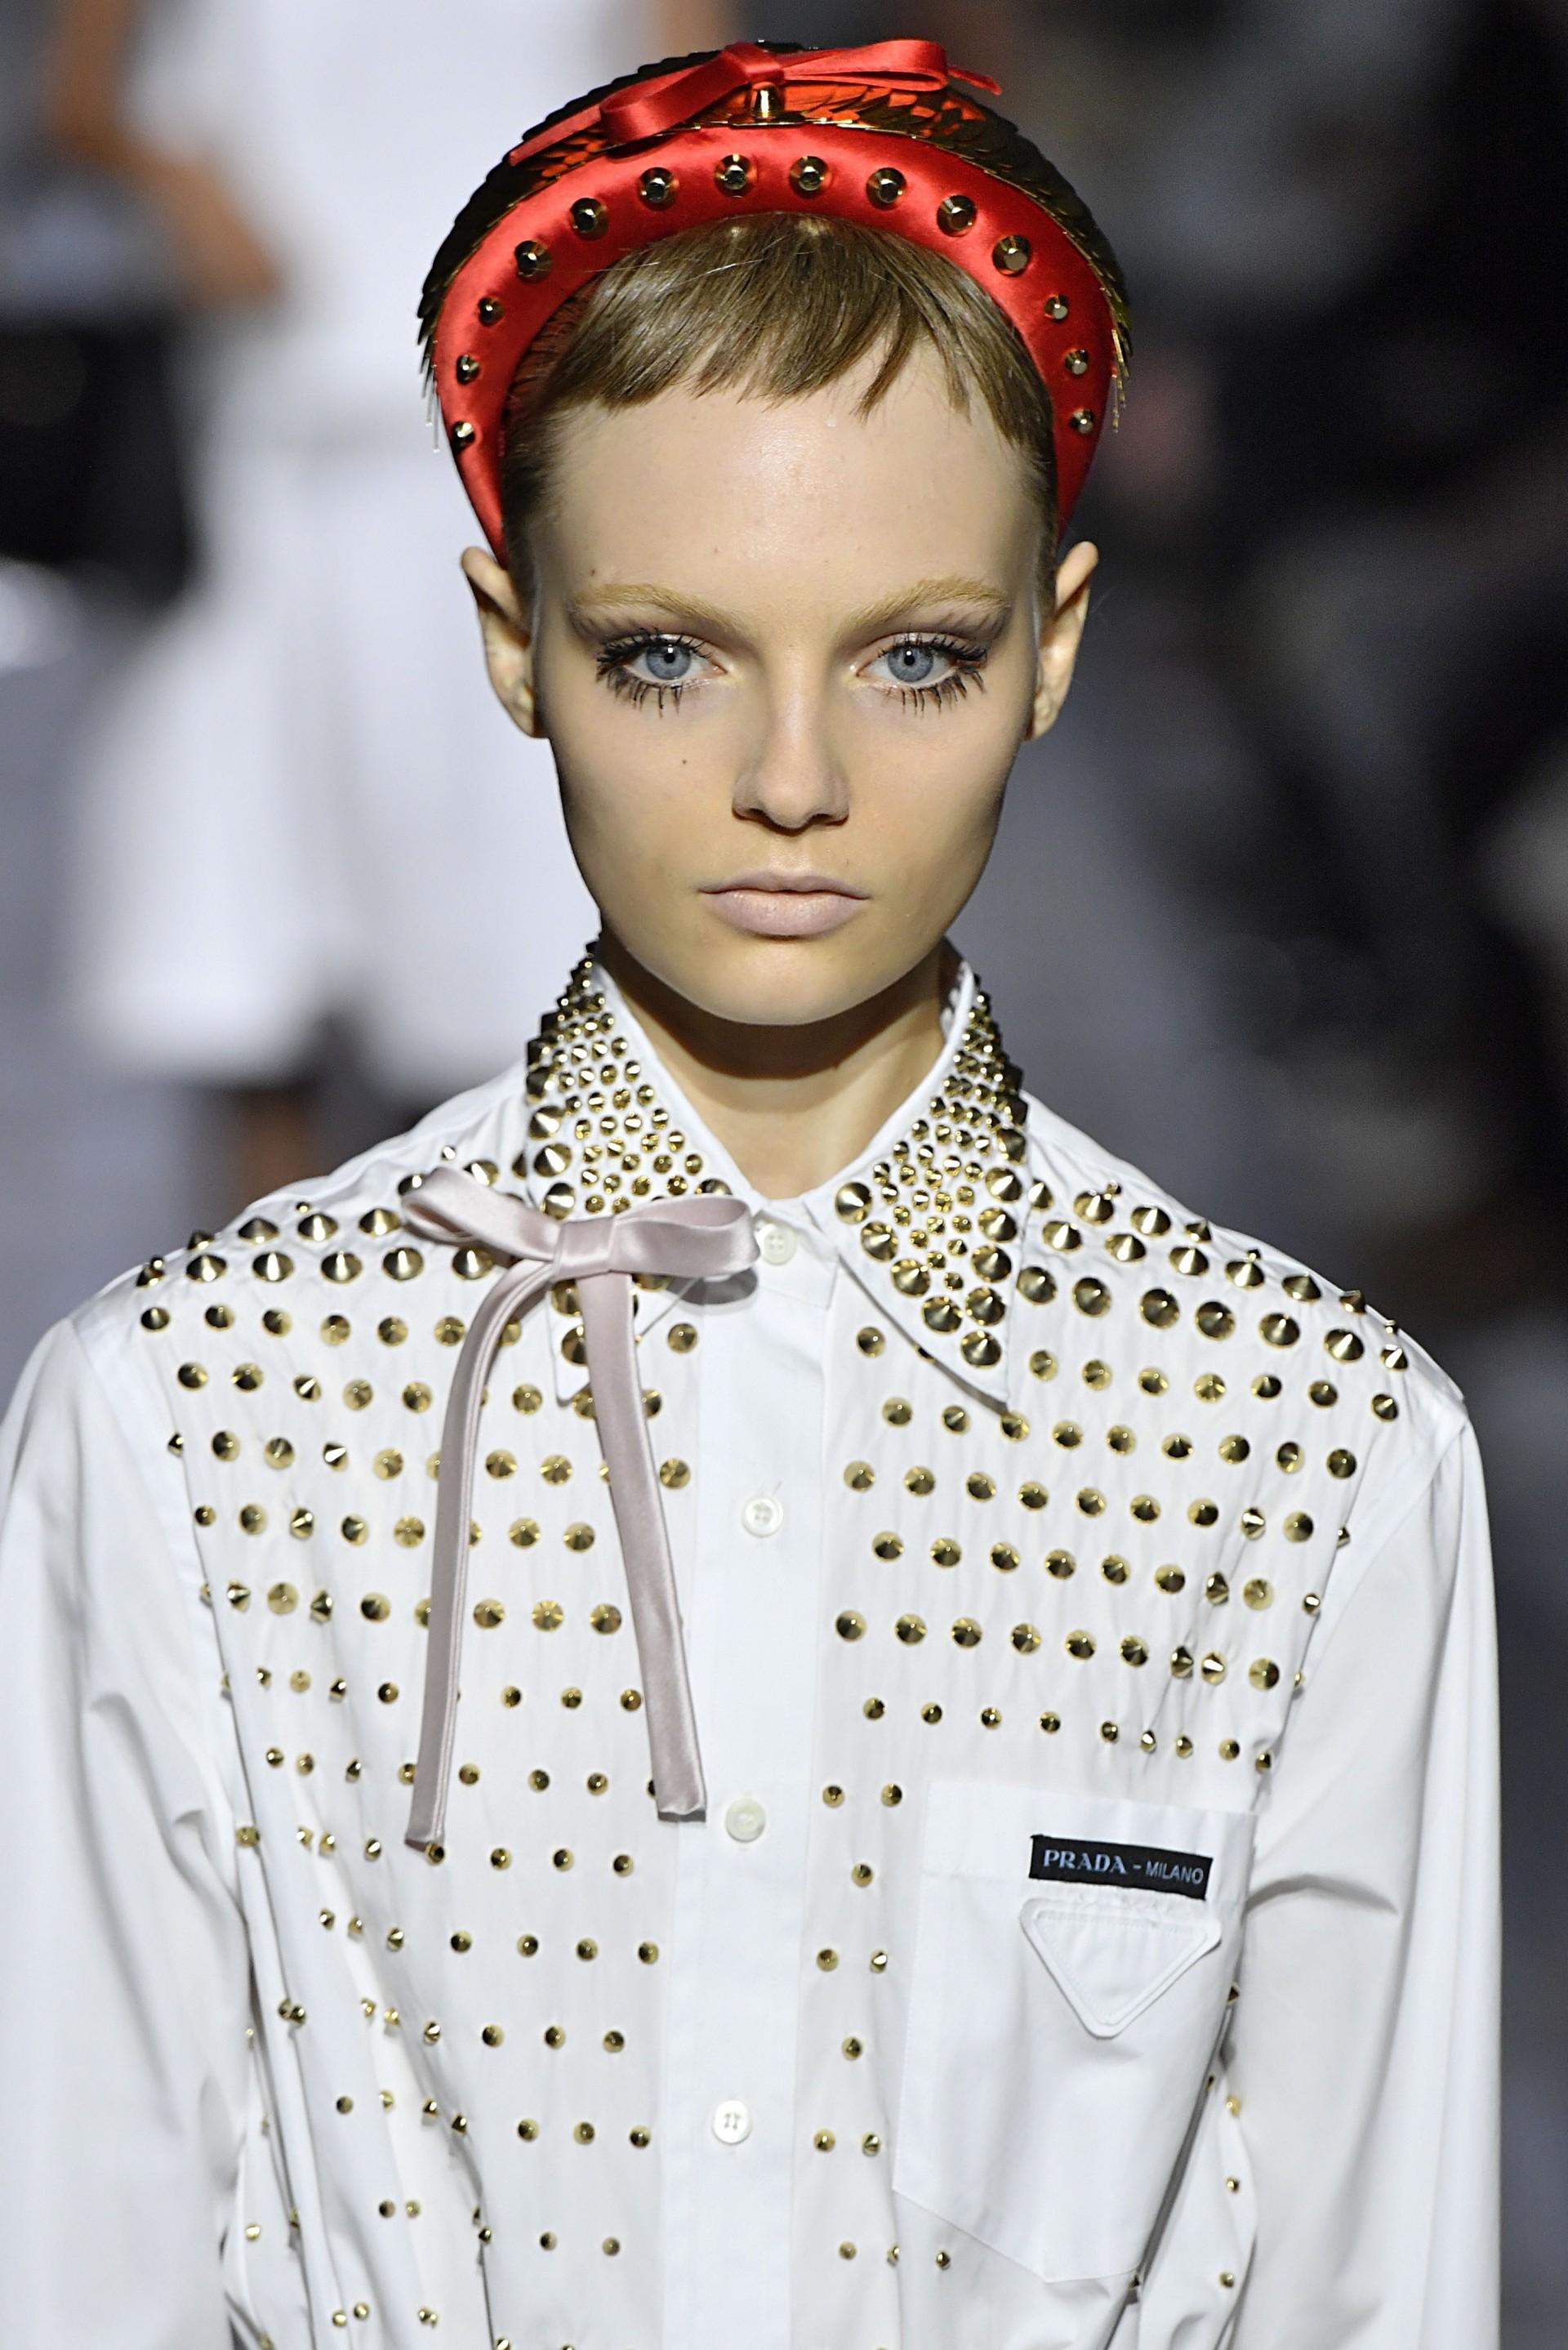 202b030e4236 Padded Satin Headbands Are Winter s Unsung Style Hero